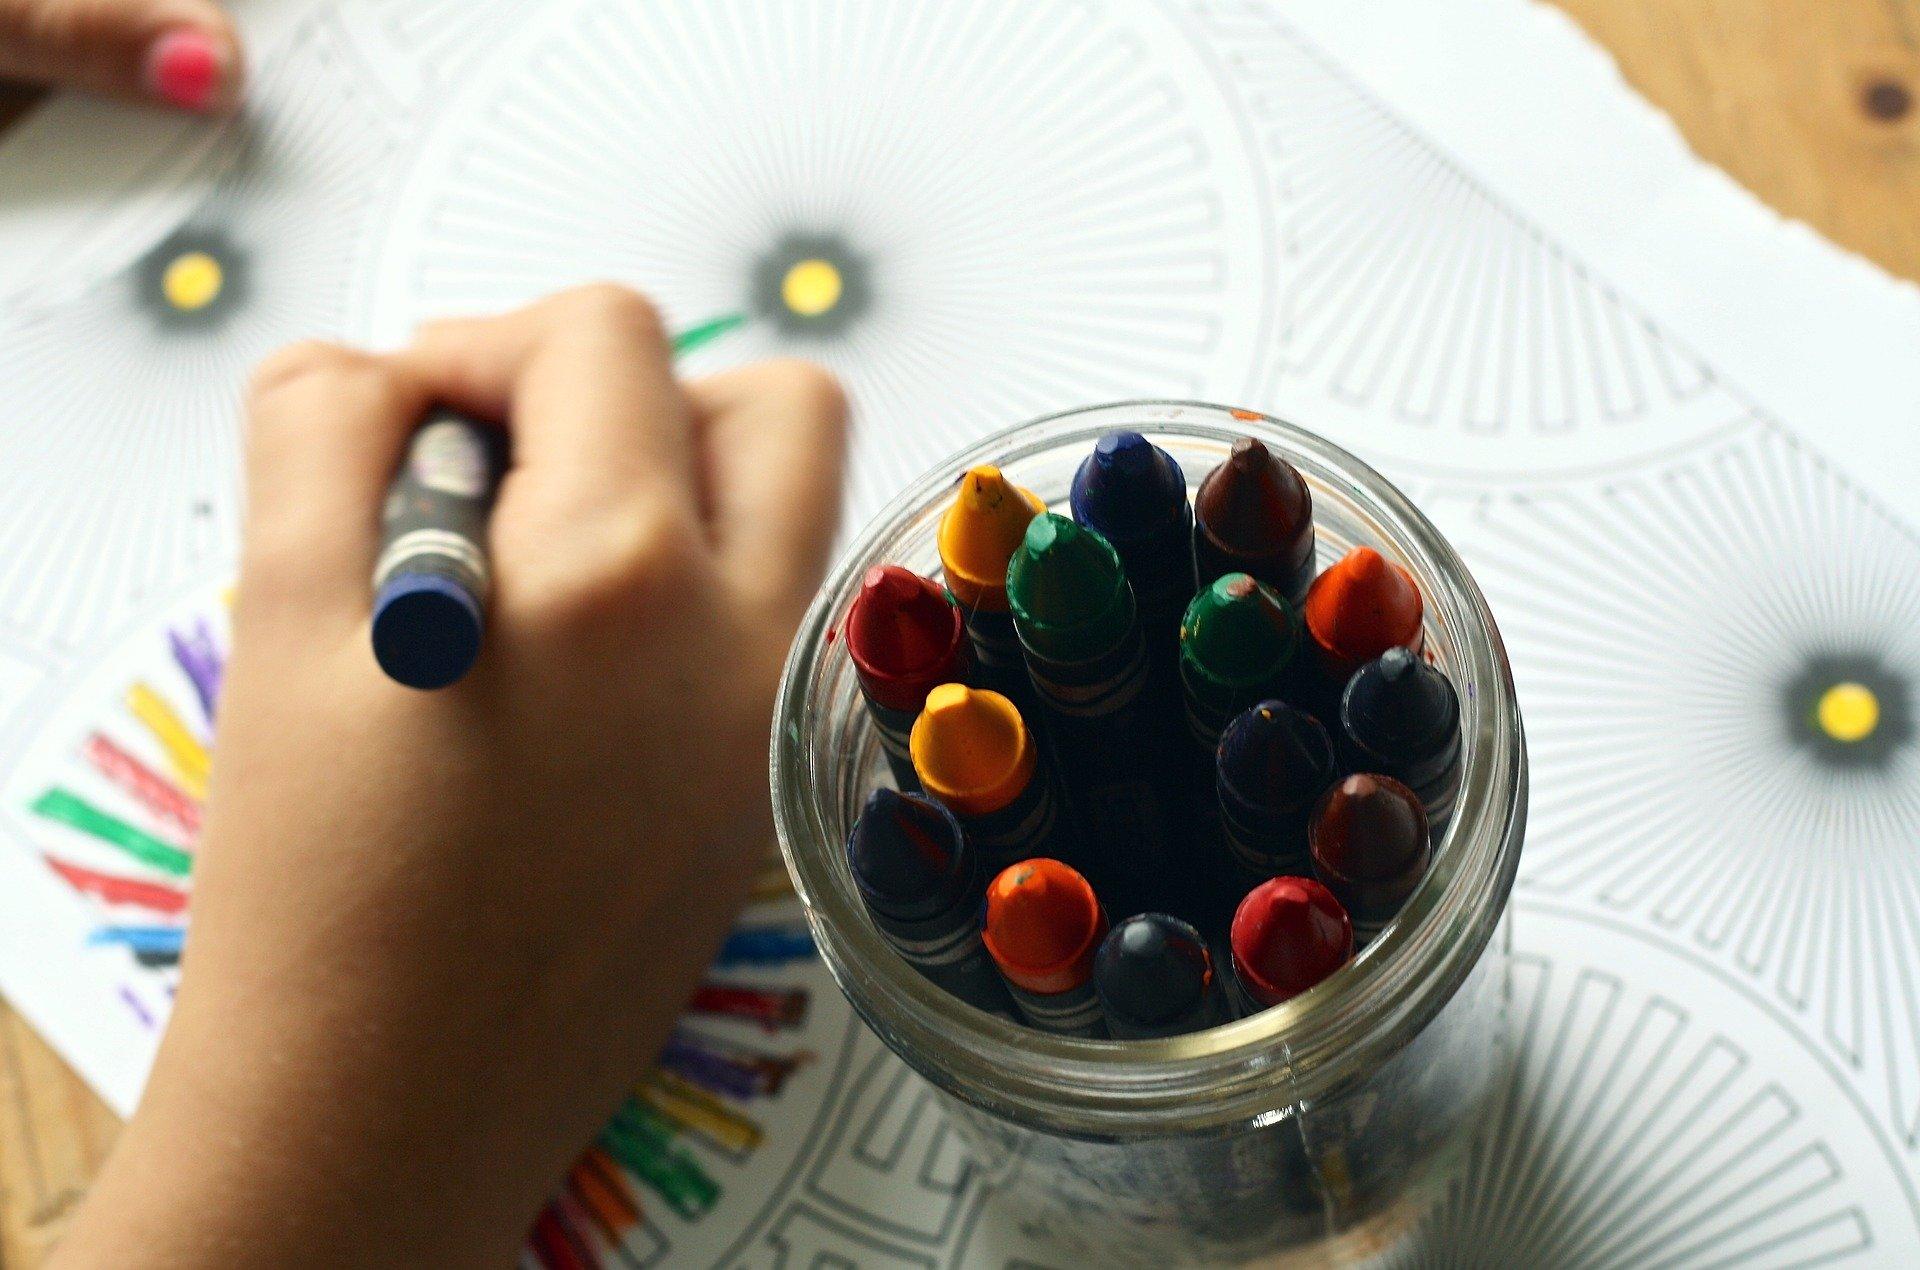 Crayons 1445053 1920